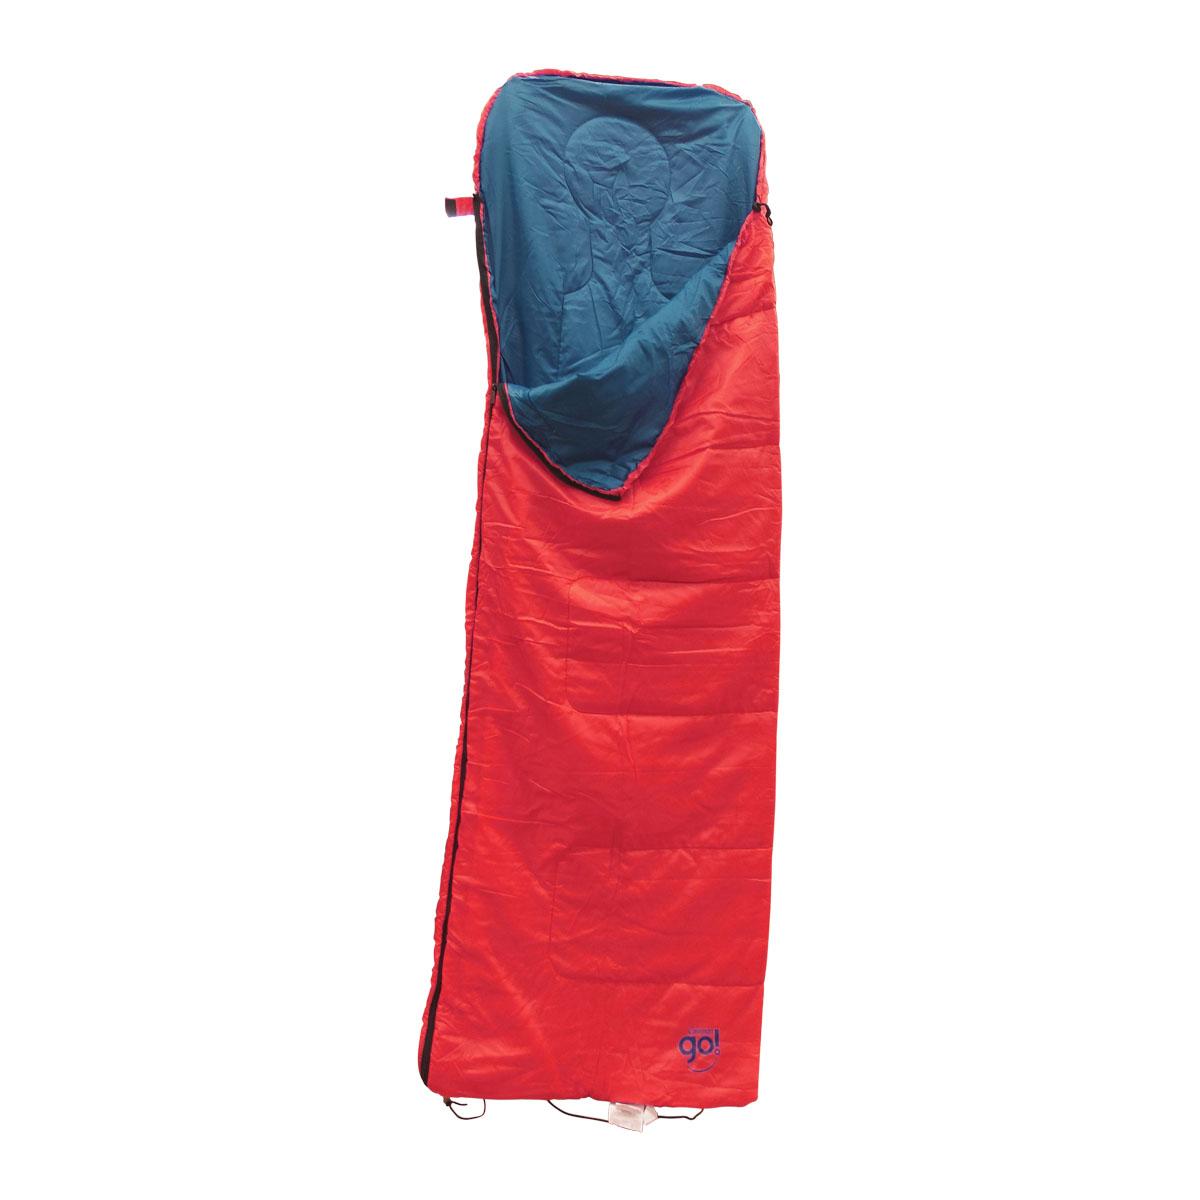 Bolsa Dormir Con Gorro Coral GO Campismo 2000022252 Coleman